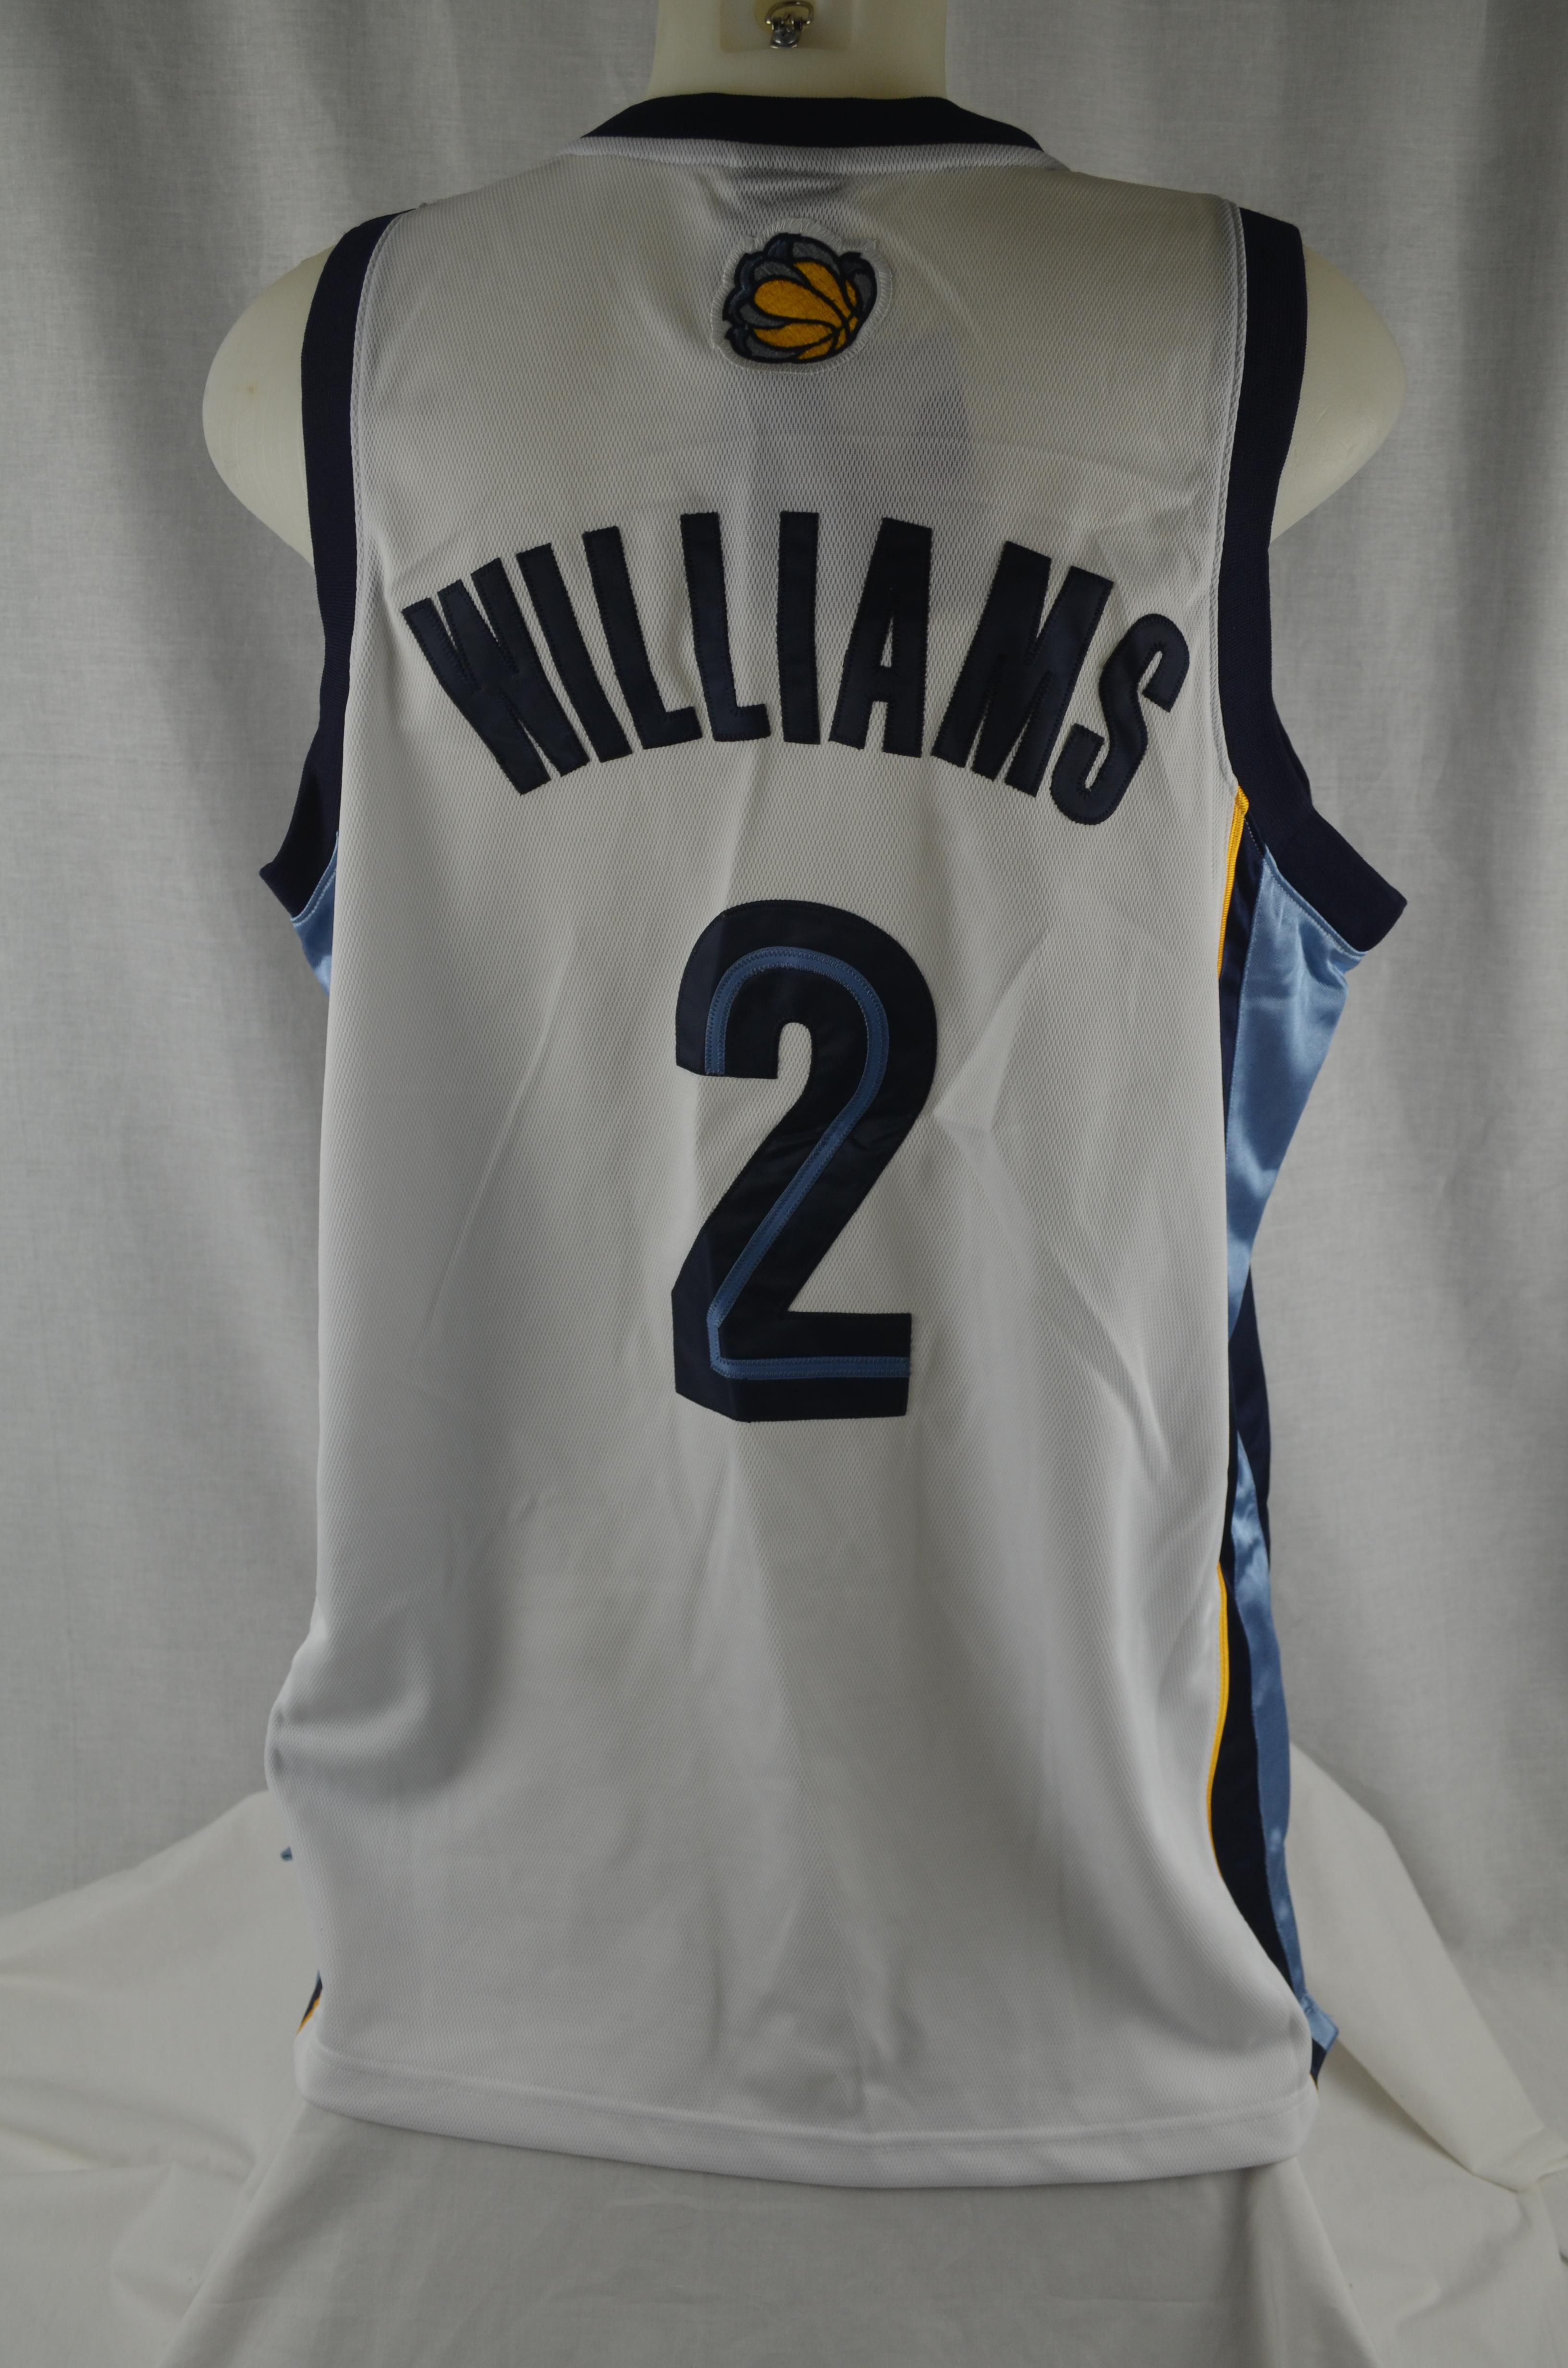 7836dce0c5c1 Jason Williams Memphis Grizzlies Authentic Reebok Basketball Jersey ...